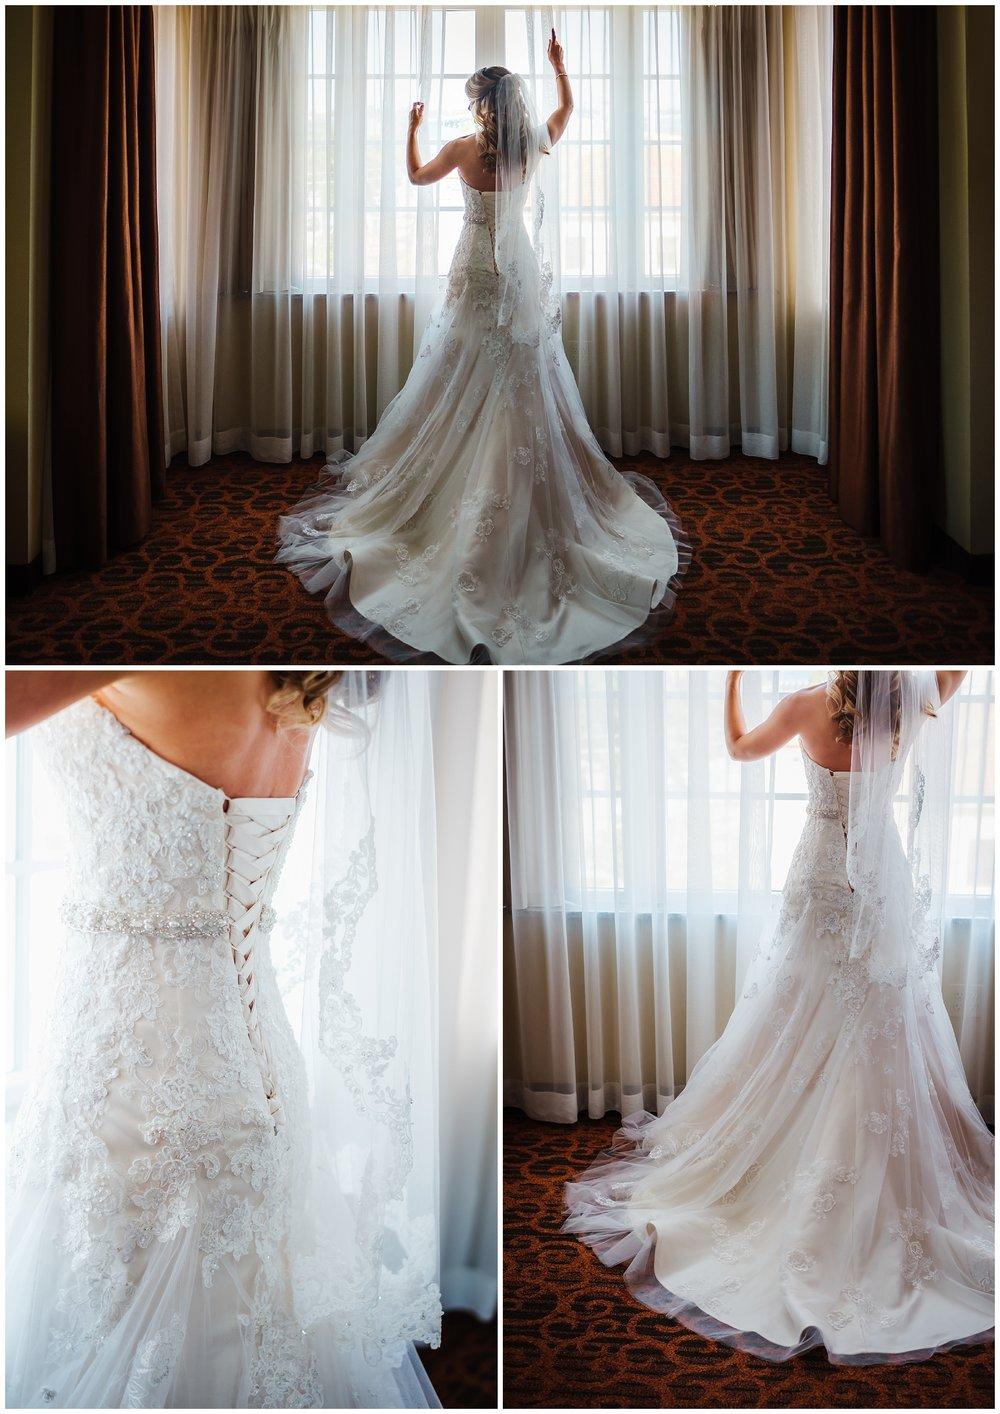 tampa-bradenton-wedding-photographer-south-florida-museum-classic-blush-gold-alpacas-sparklers_0015.jpg